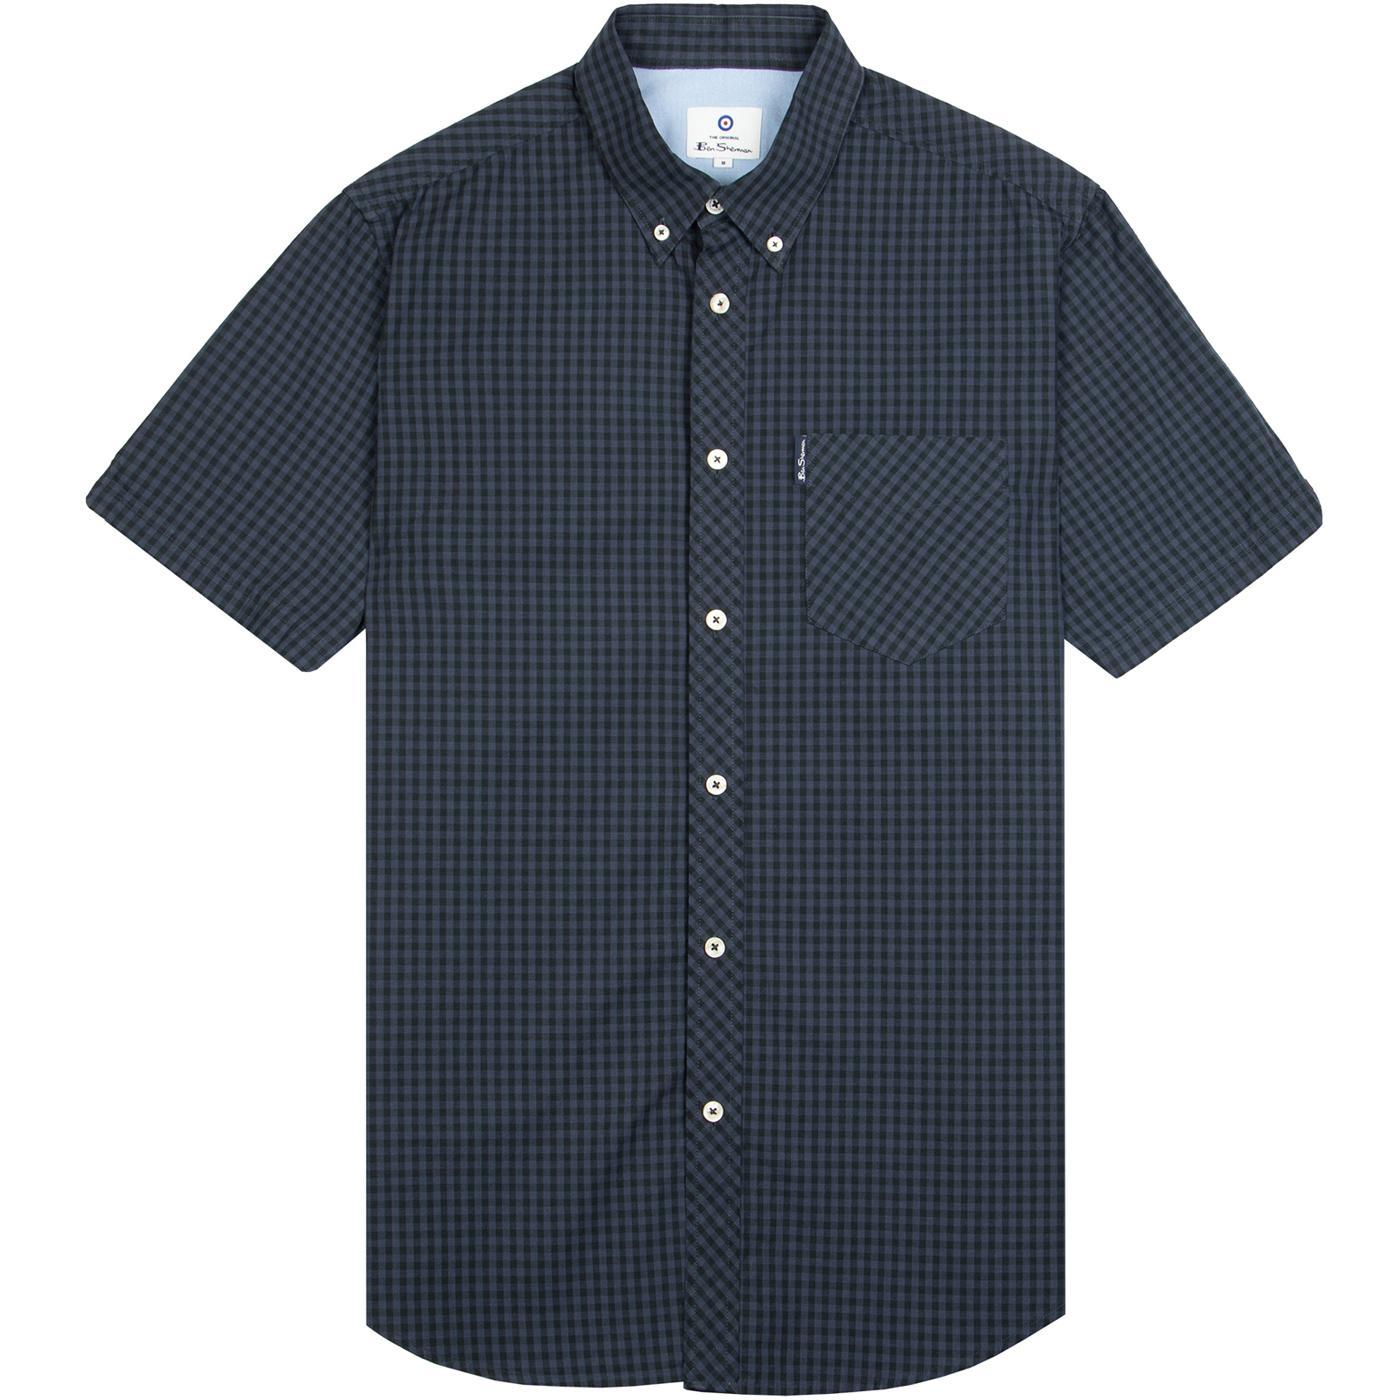 BEN SHERMAN Mod SS Signature Gingham Shirt (B/G)